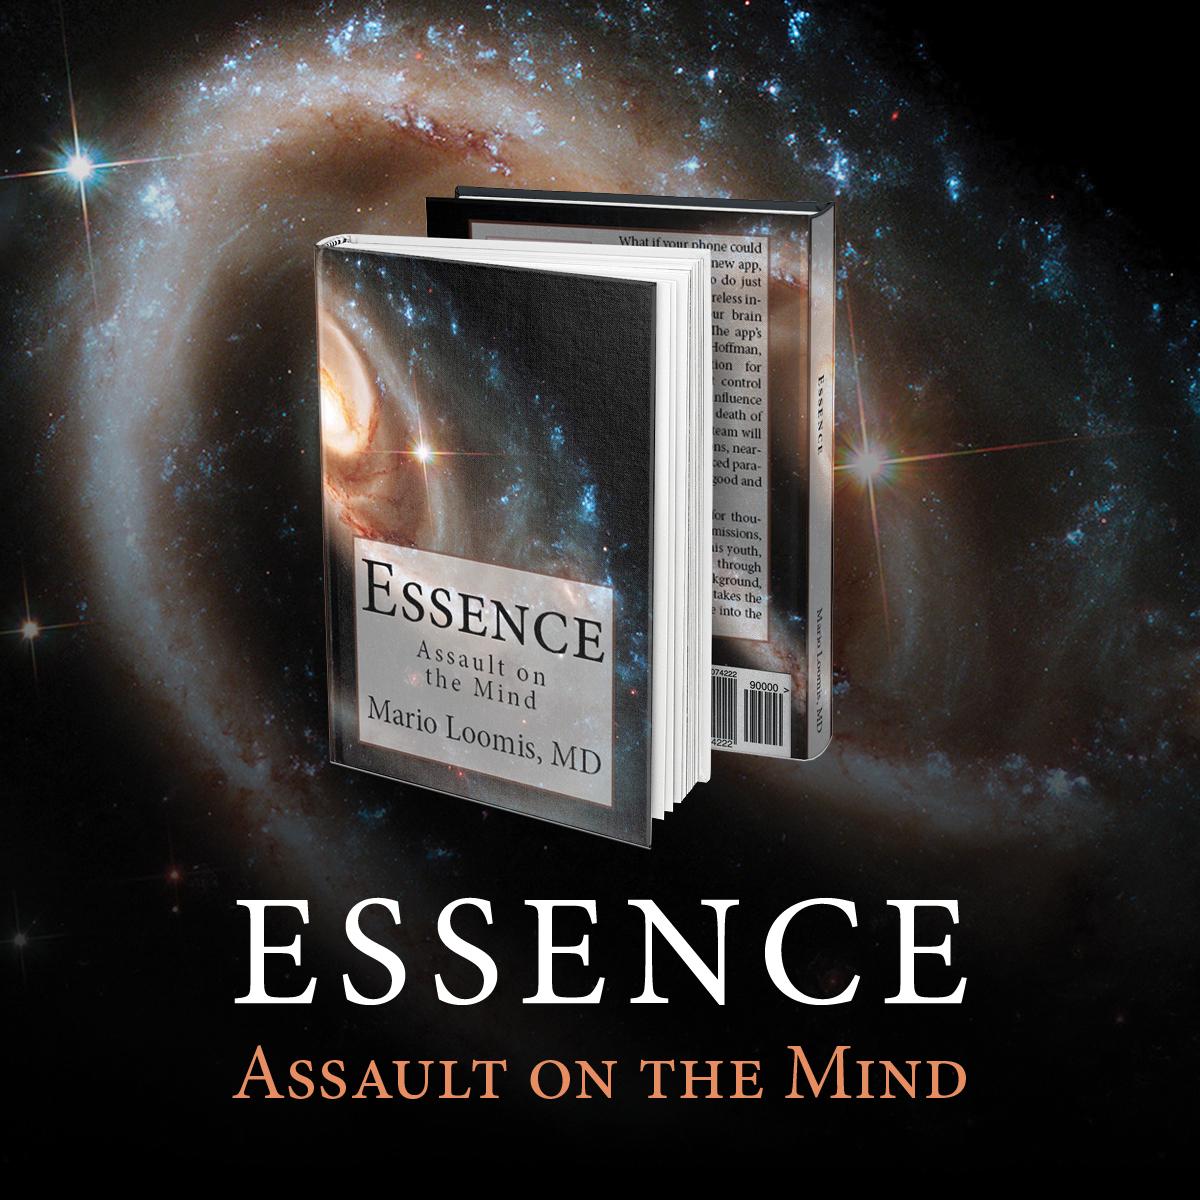 Essence-Digital-Square2.jpg